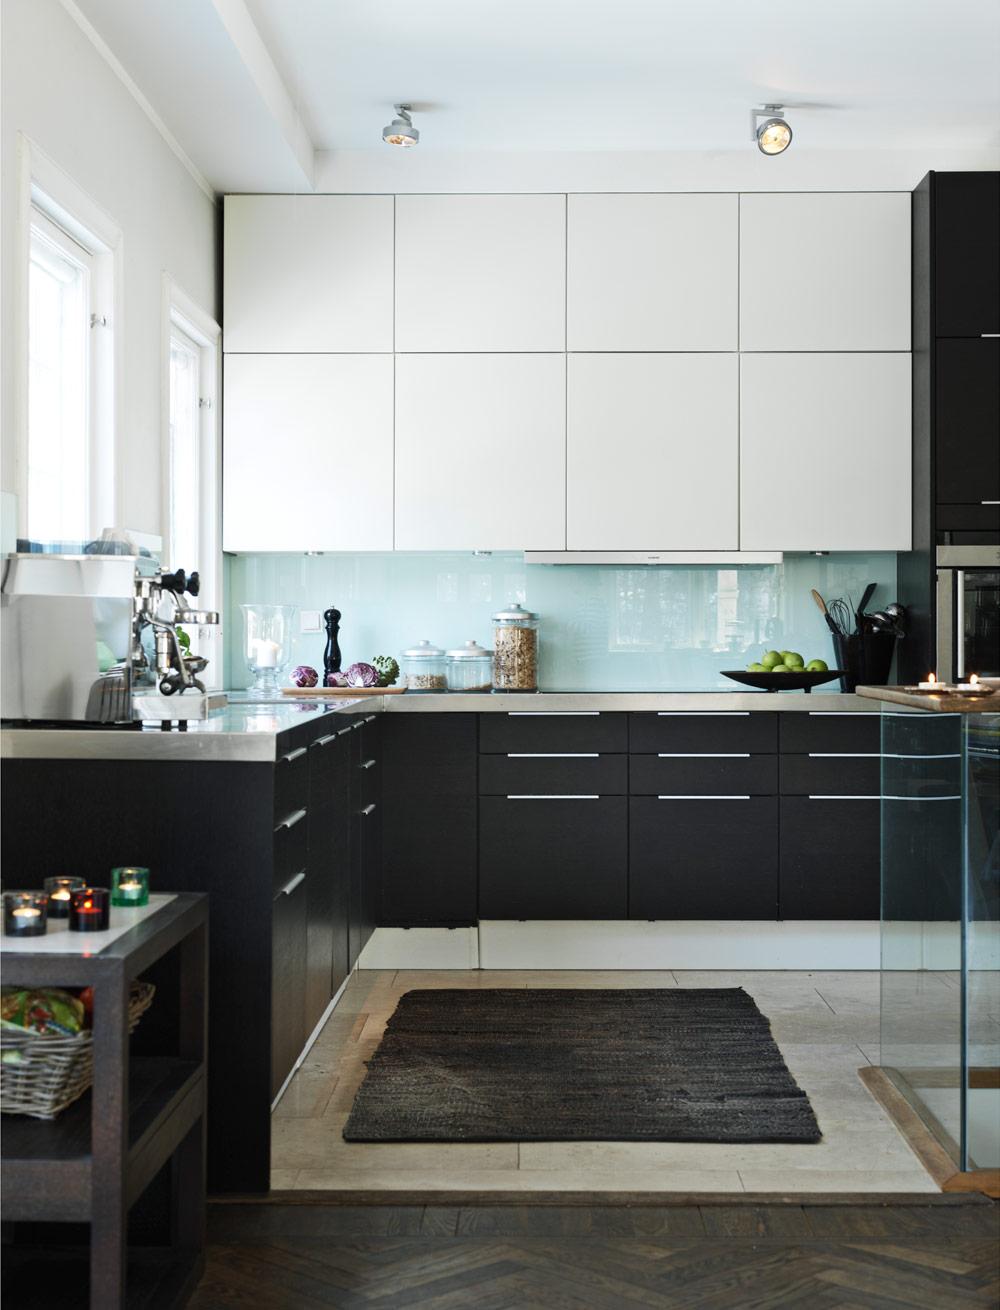 kitchen-glass-splash-guard-harringbone-parquet-ikea-hack-classic-swedish-scandinavian-nordic-style-kitchen-all-white-simple-minimalist-modern-black-and-white-cabinets